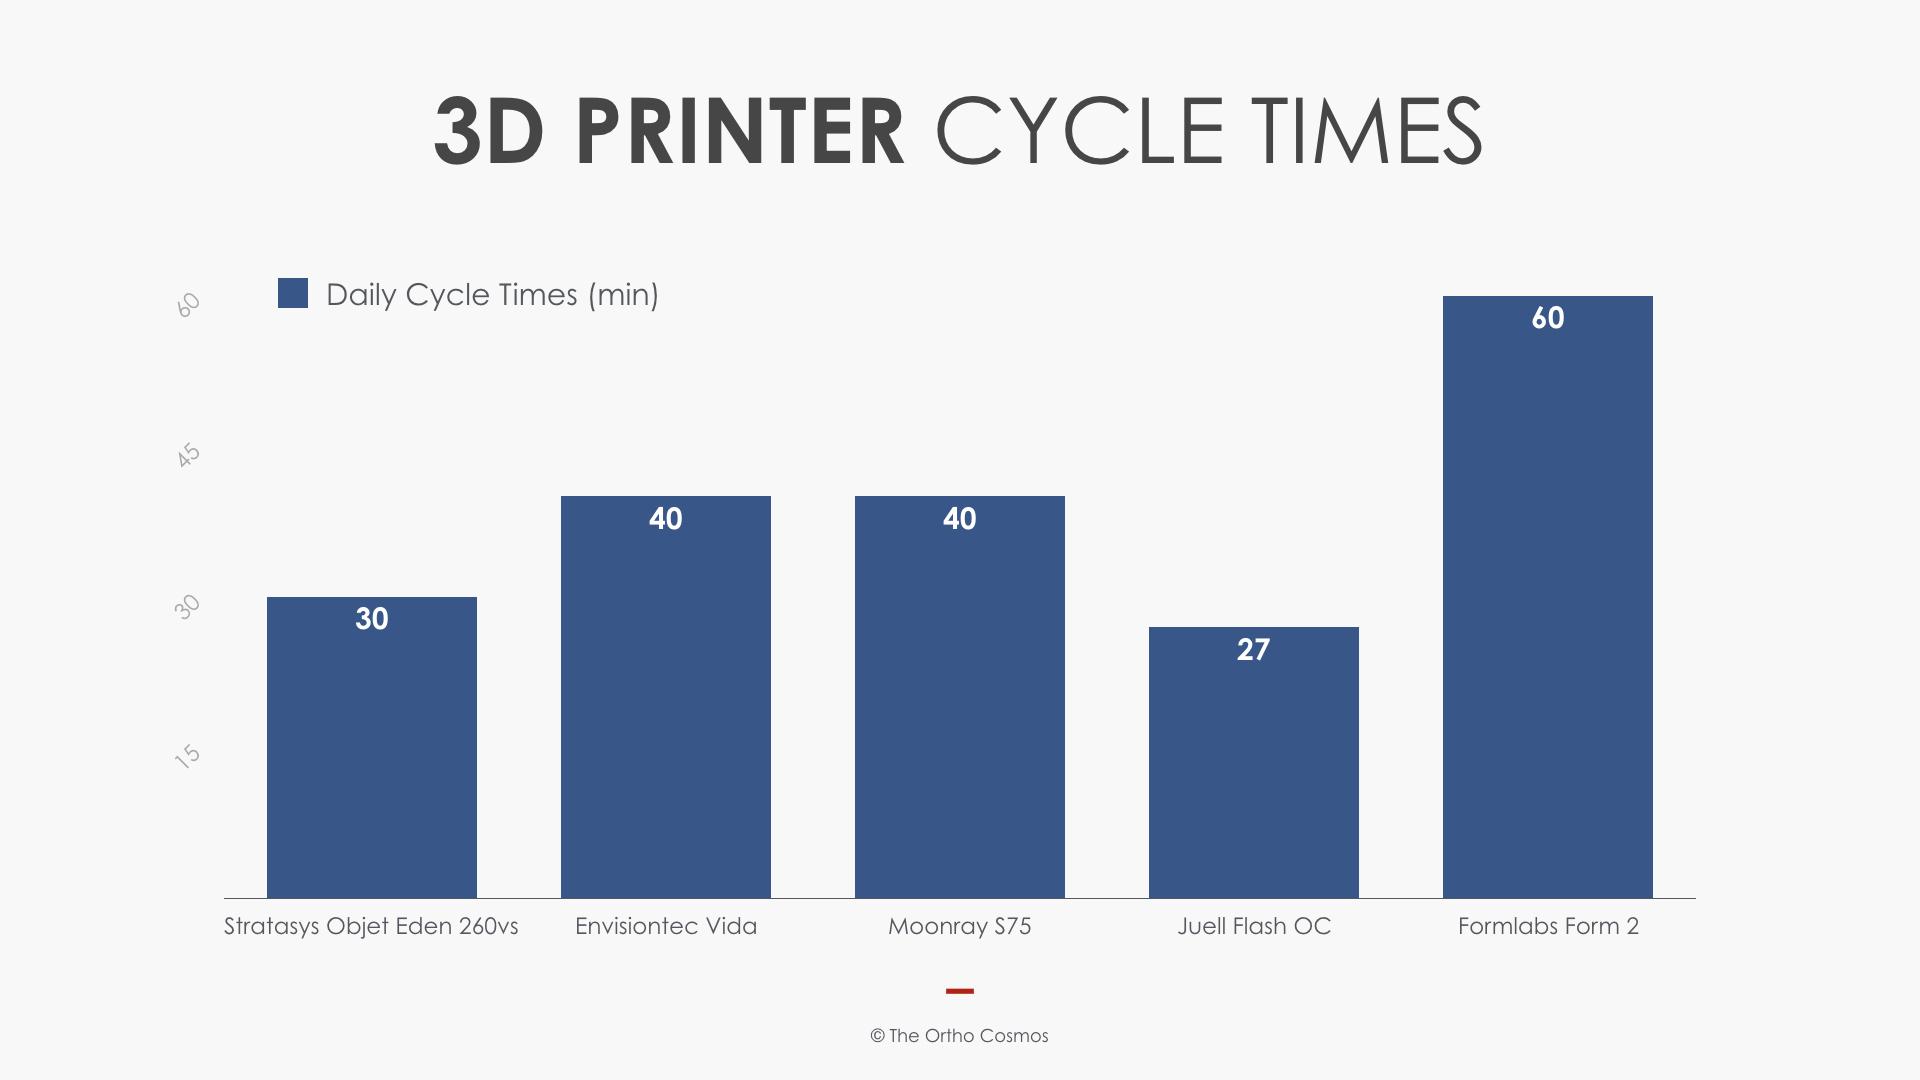 3D Printer Cycle Times